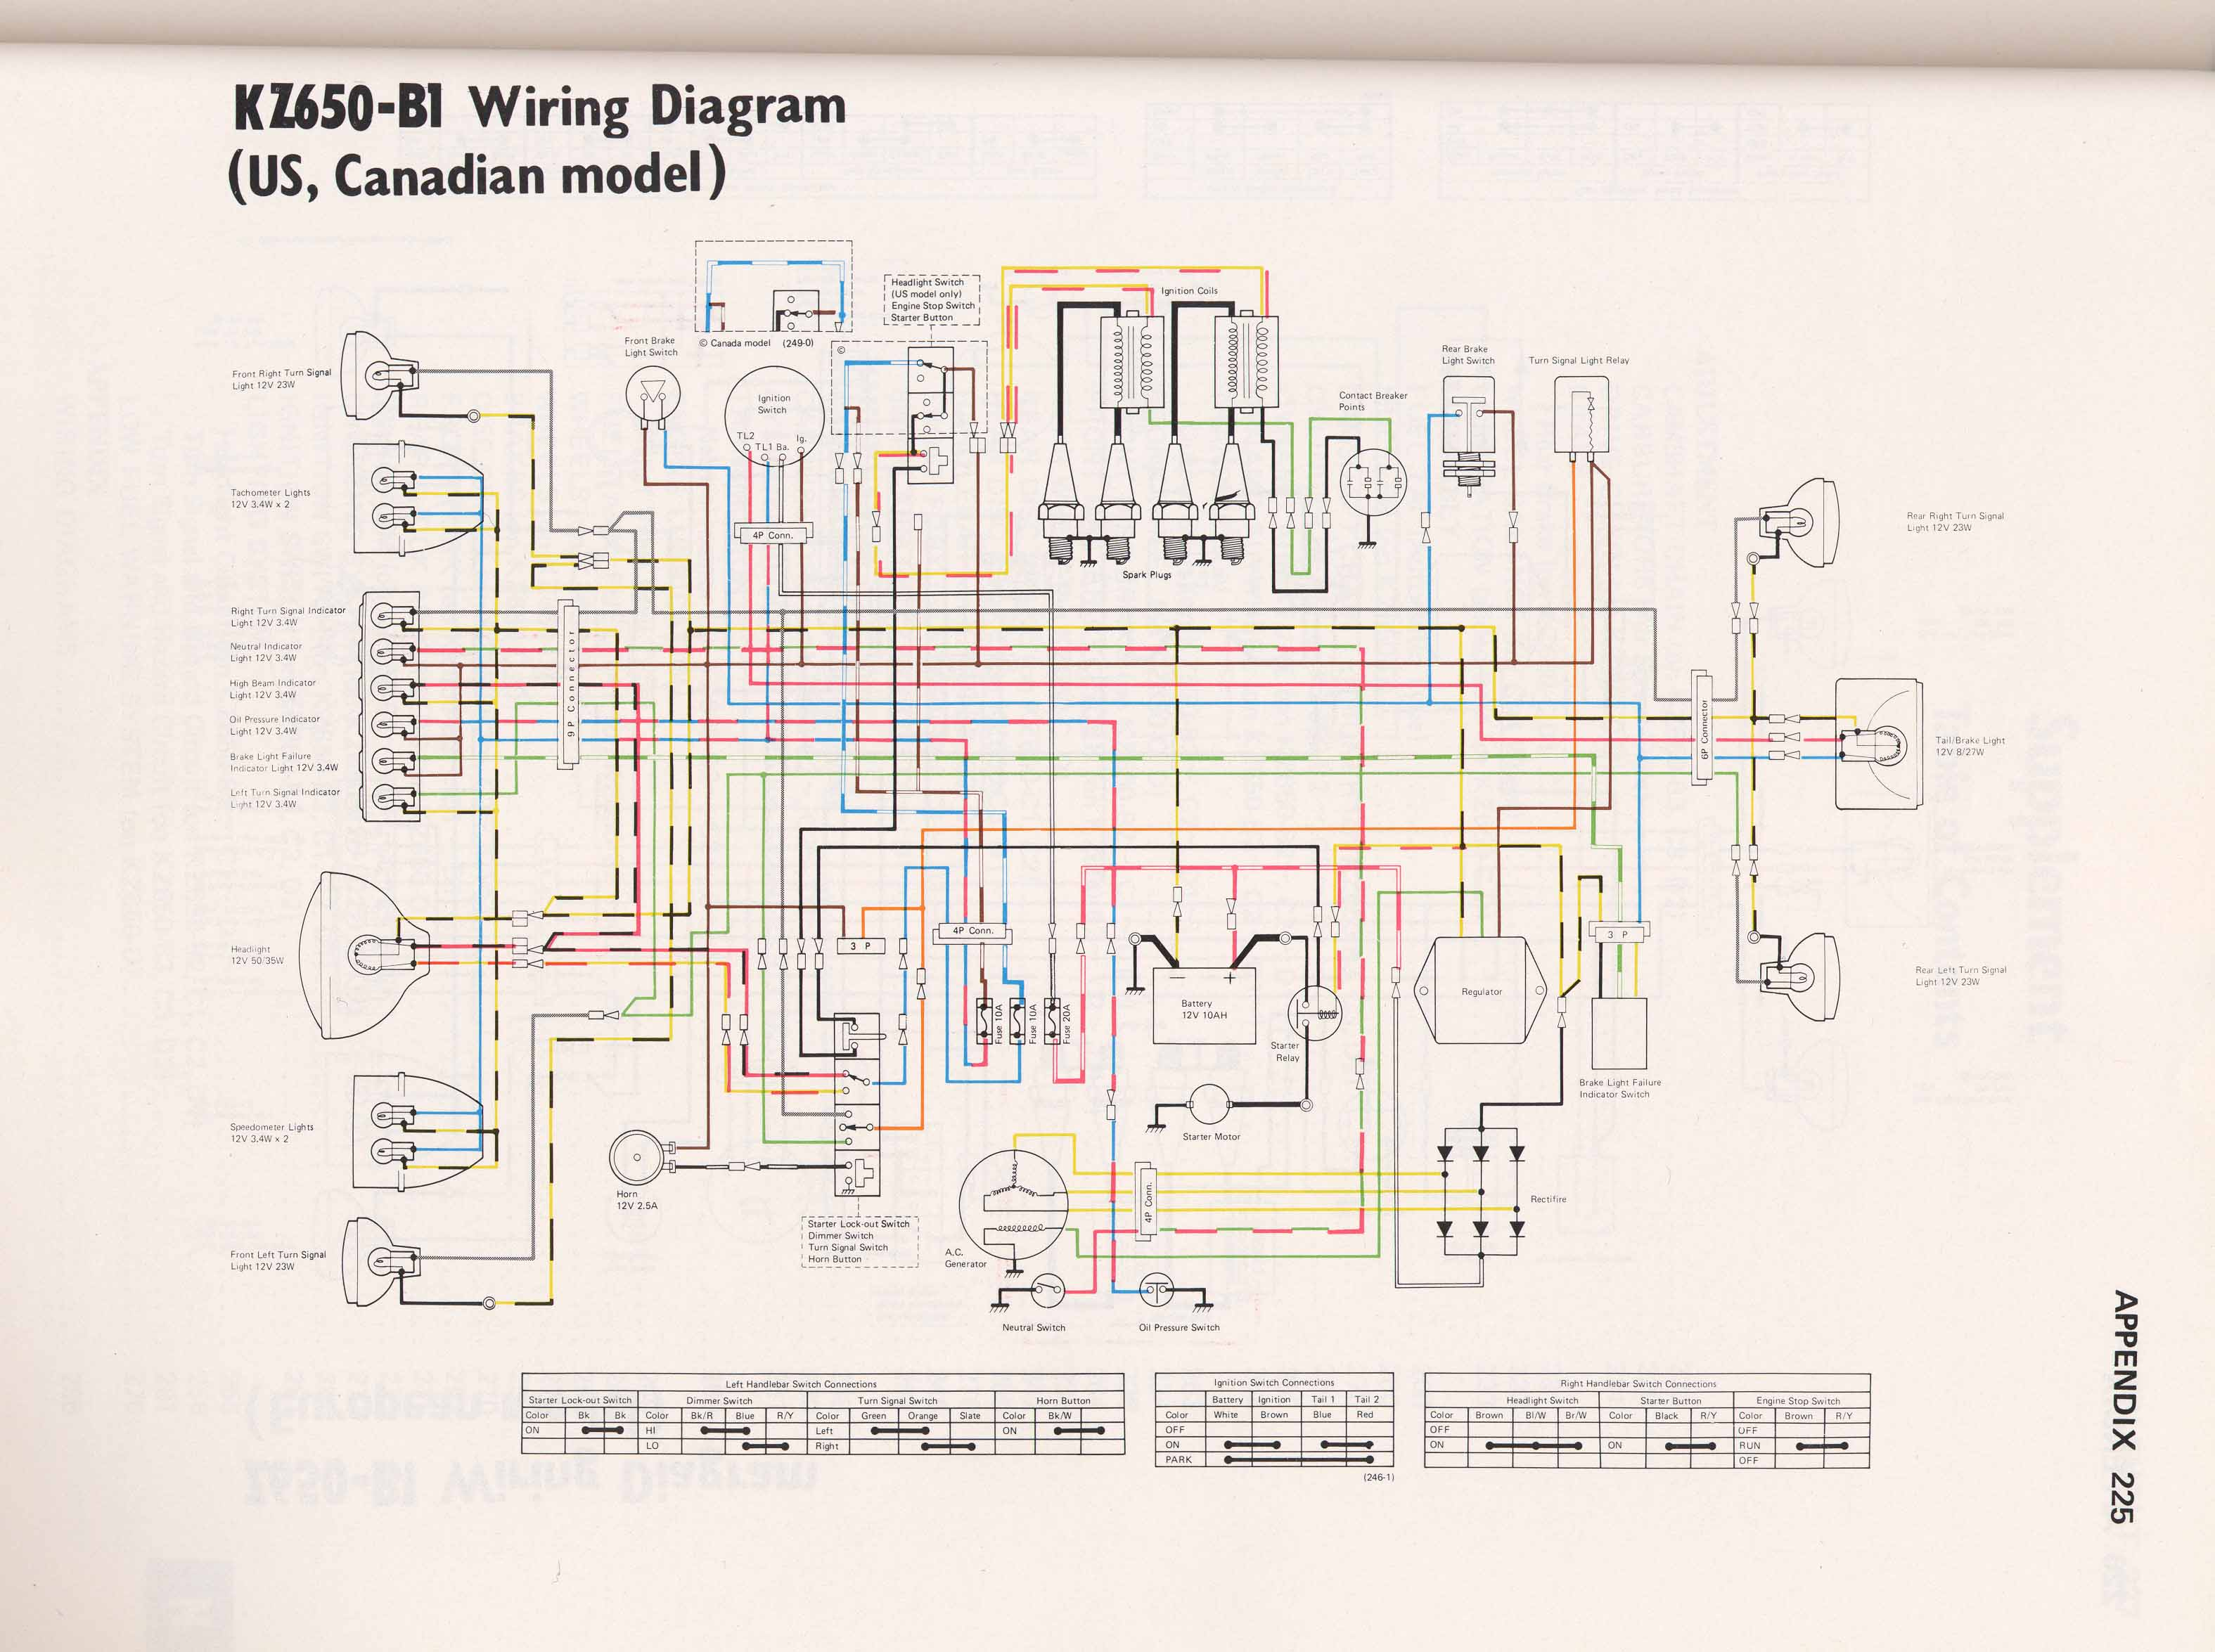 Swell Kz650 Wiring Harness Diagram Online Wiring Diagram Wiring Cloud Biosomenaidewilluminateatxorg